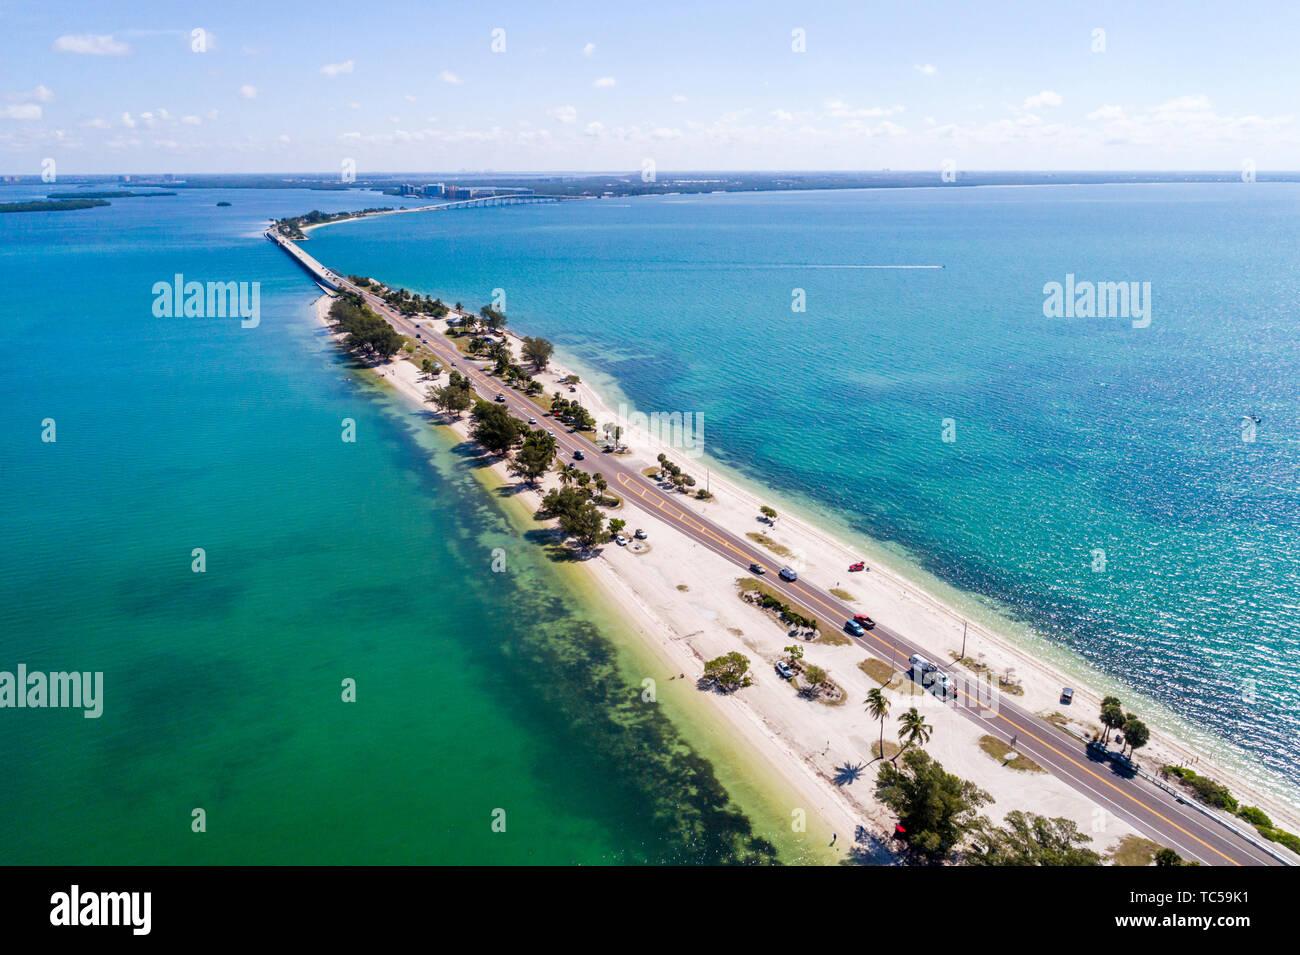 Sanibel Island Florida Causeway San Carlos Bay Causeway Islands Park aerial overhead bird's eye view above - Stock Image